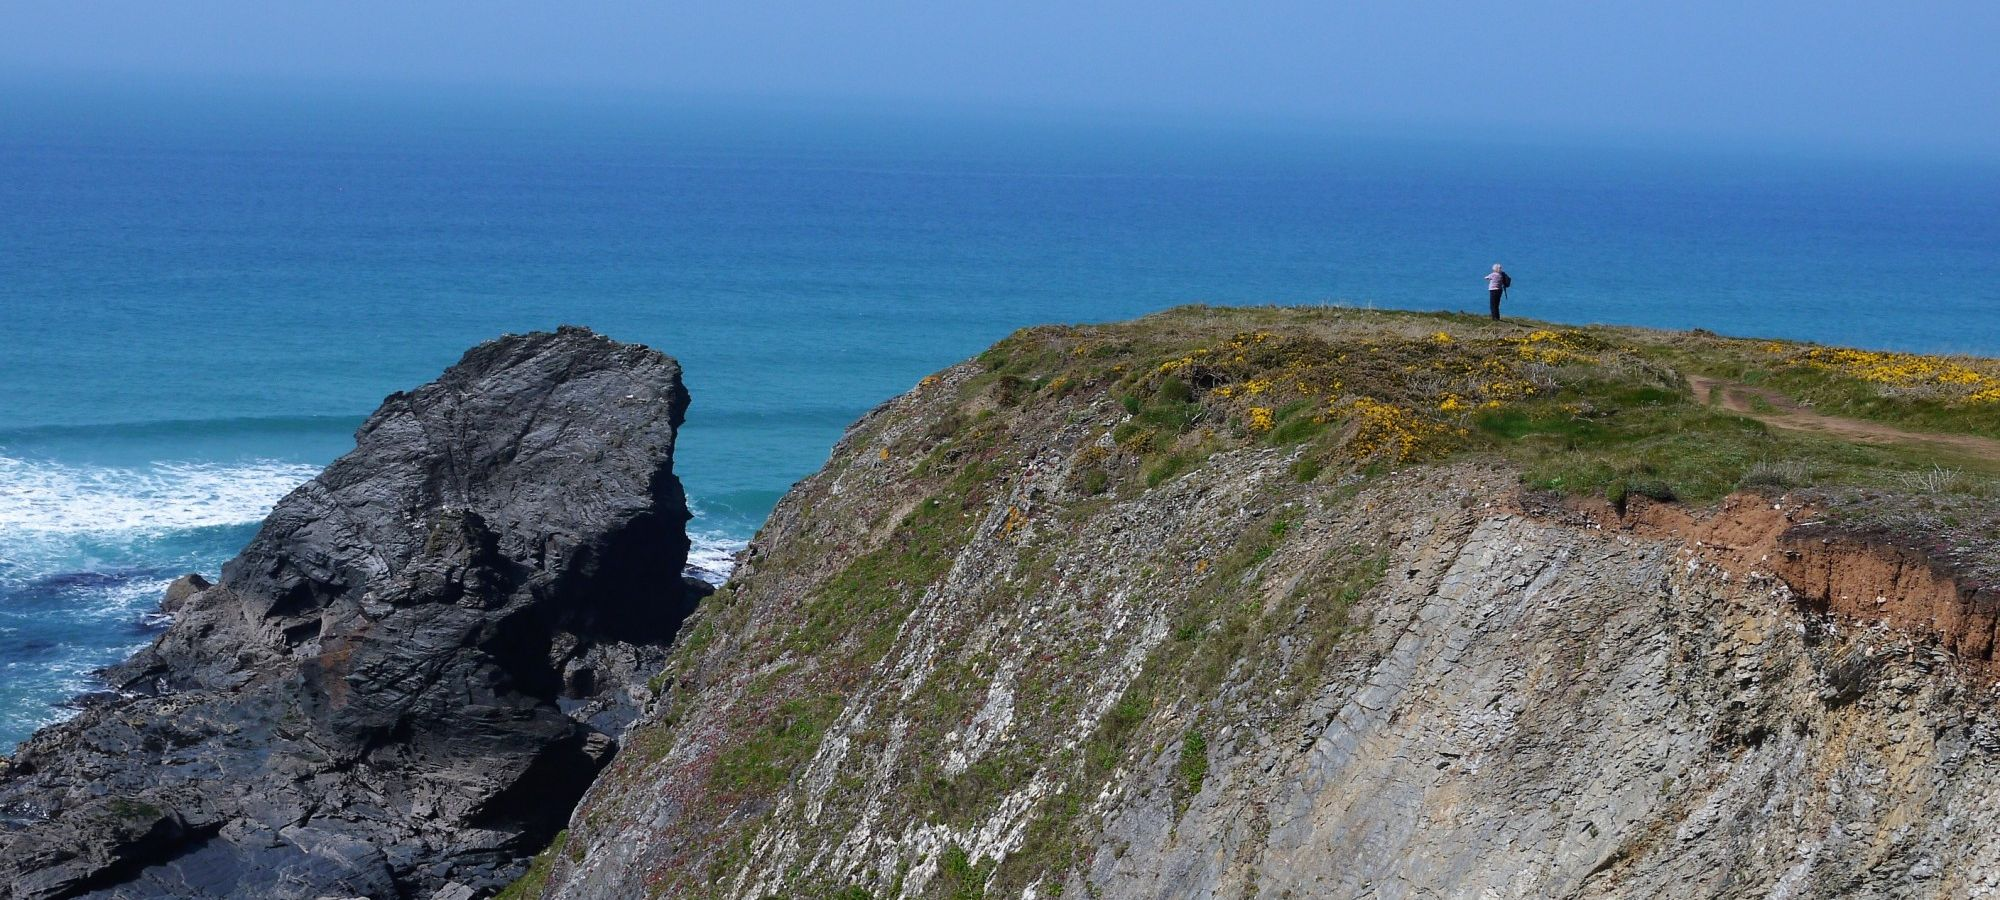 Walker on high cliff top